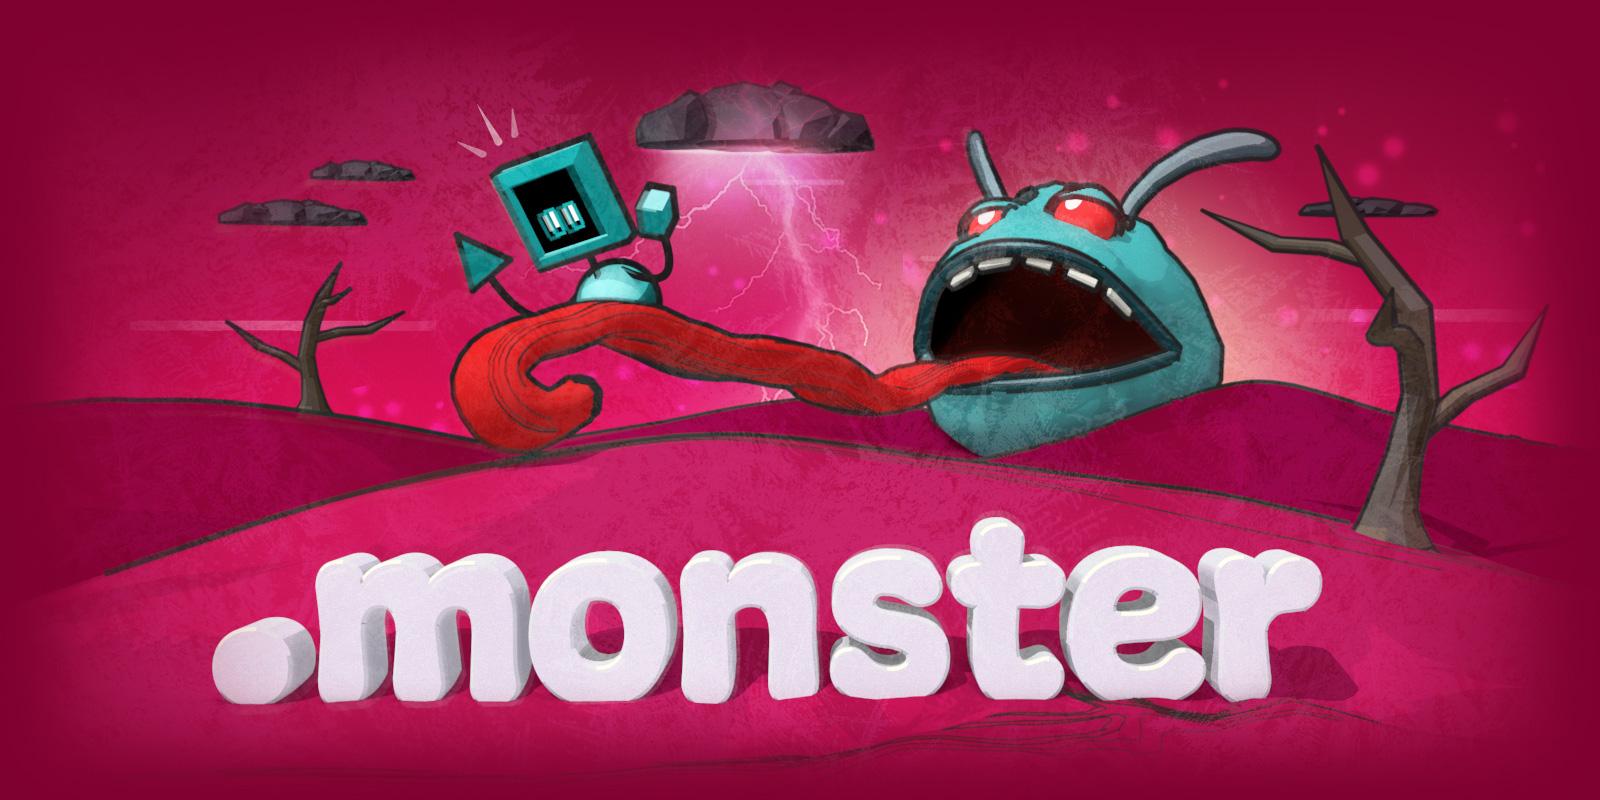 怪兽(.MONSTER)来了!